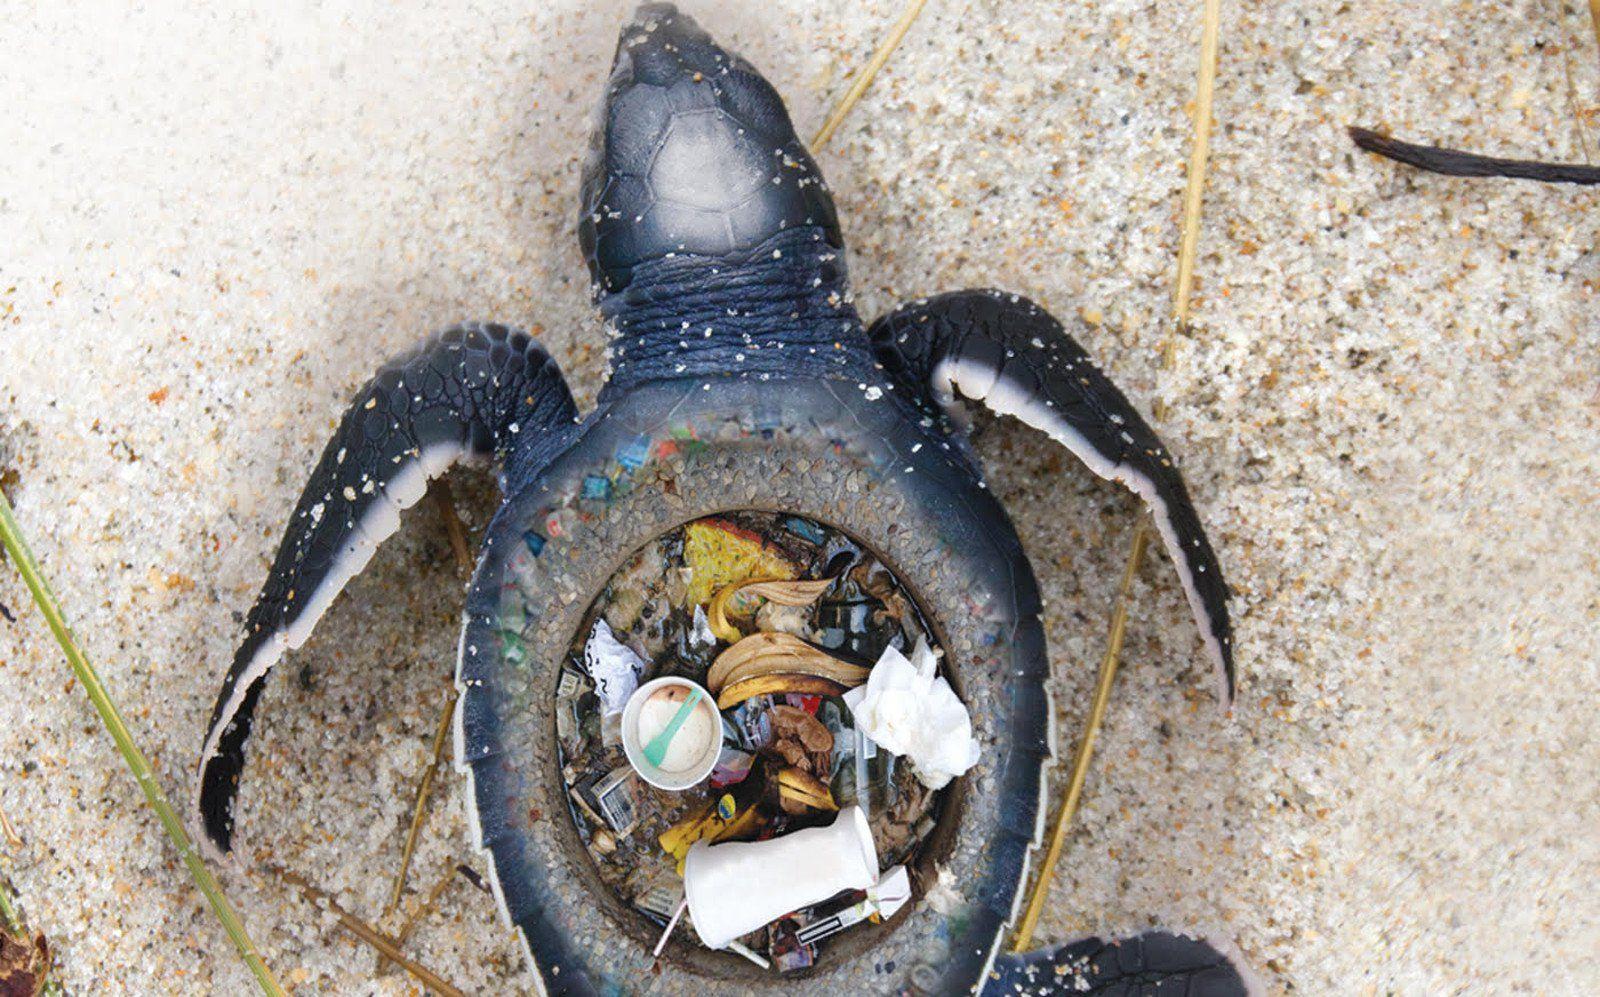 Stunning Images Expose The Horrific Impact Of Plastic Trash On Marine Animals Marine Animals Animals Plastic Pollution